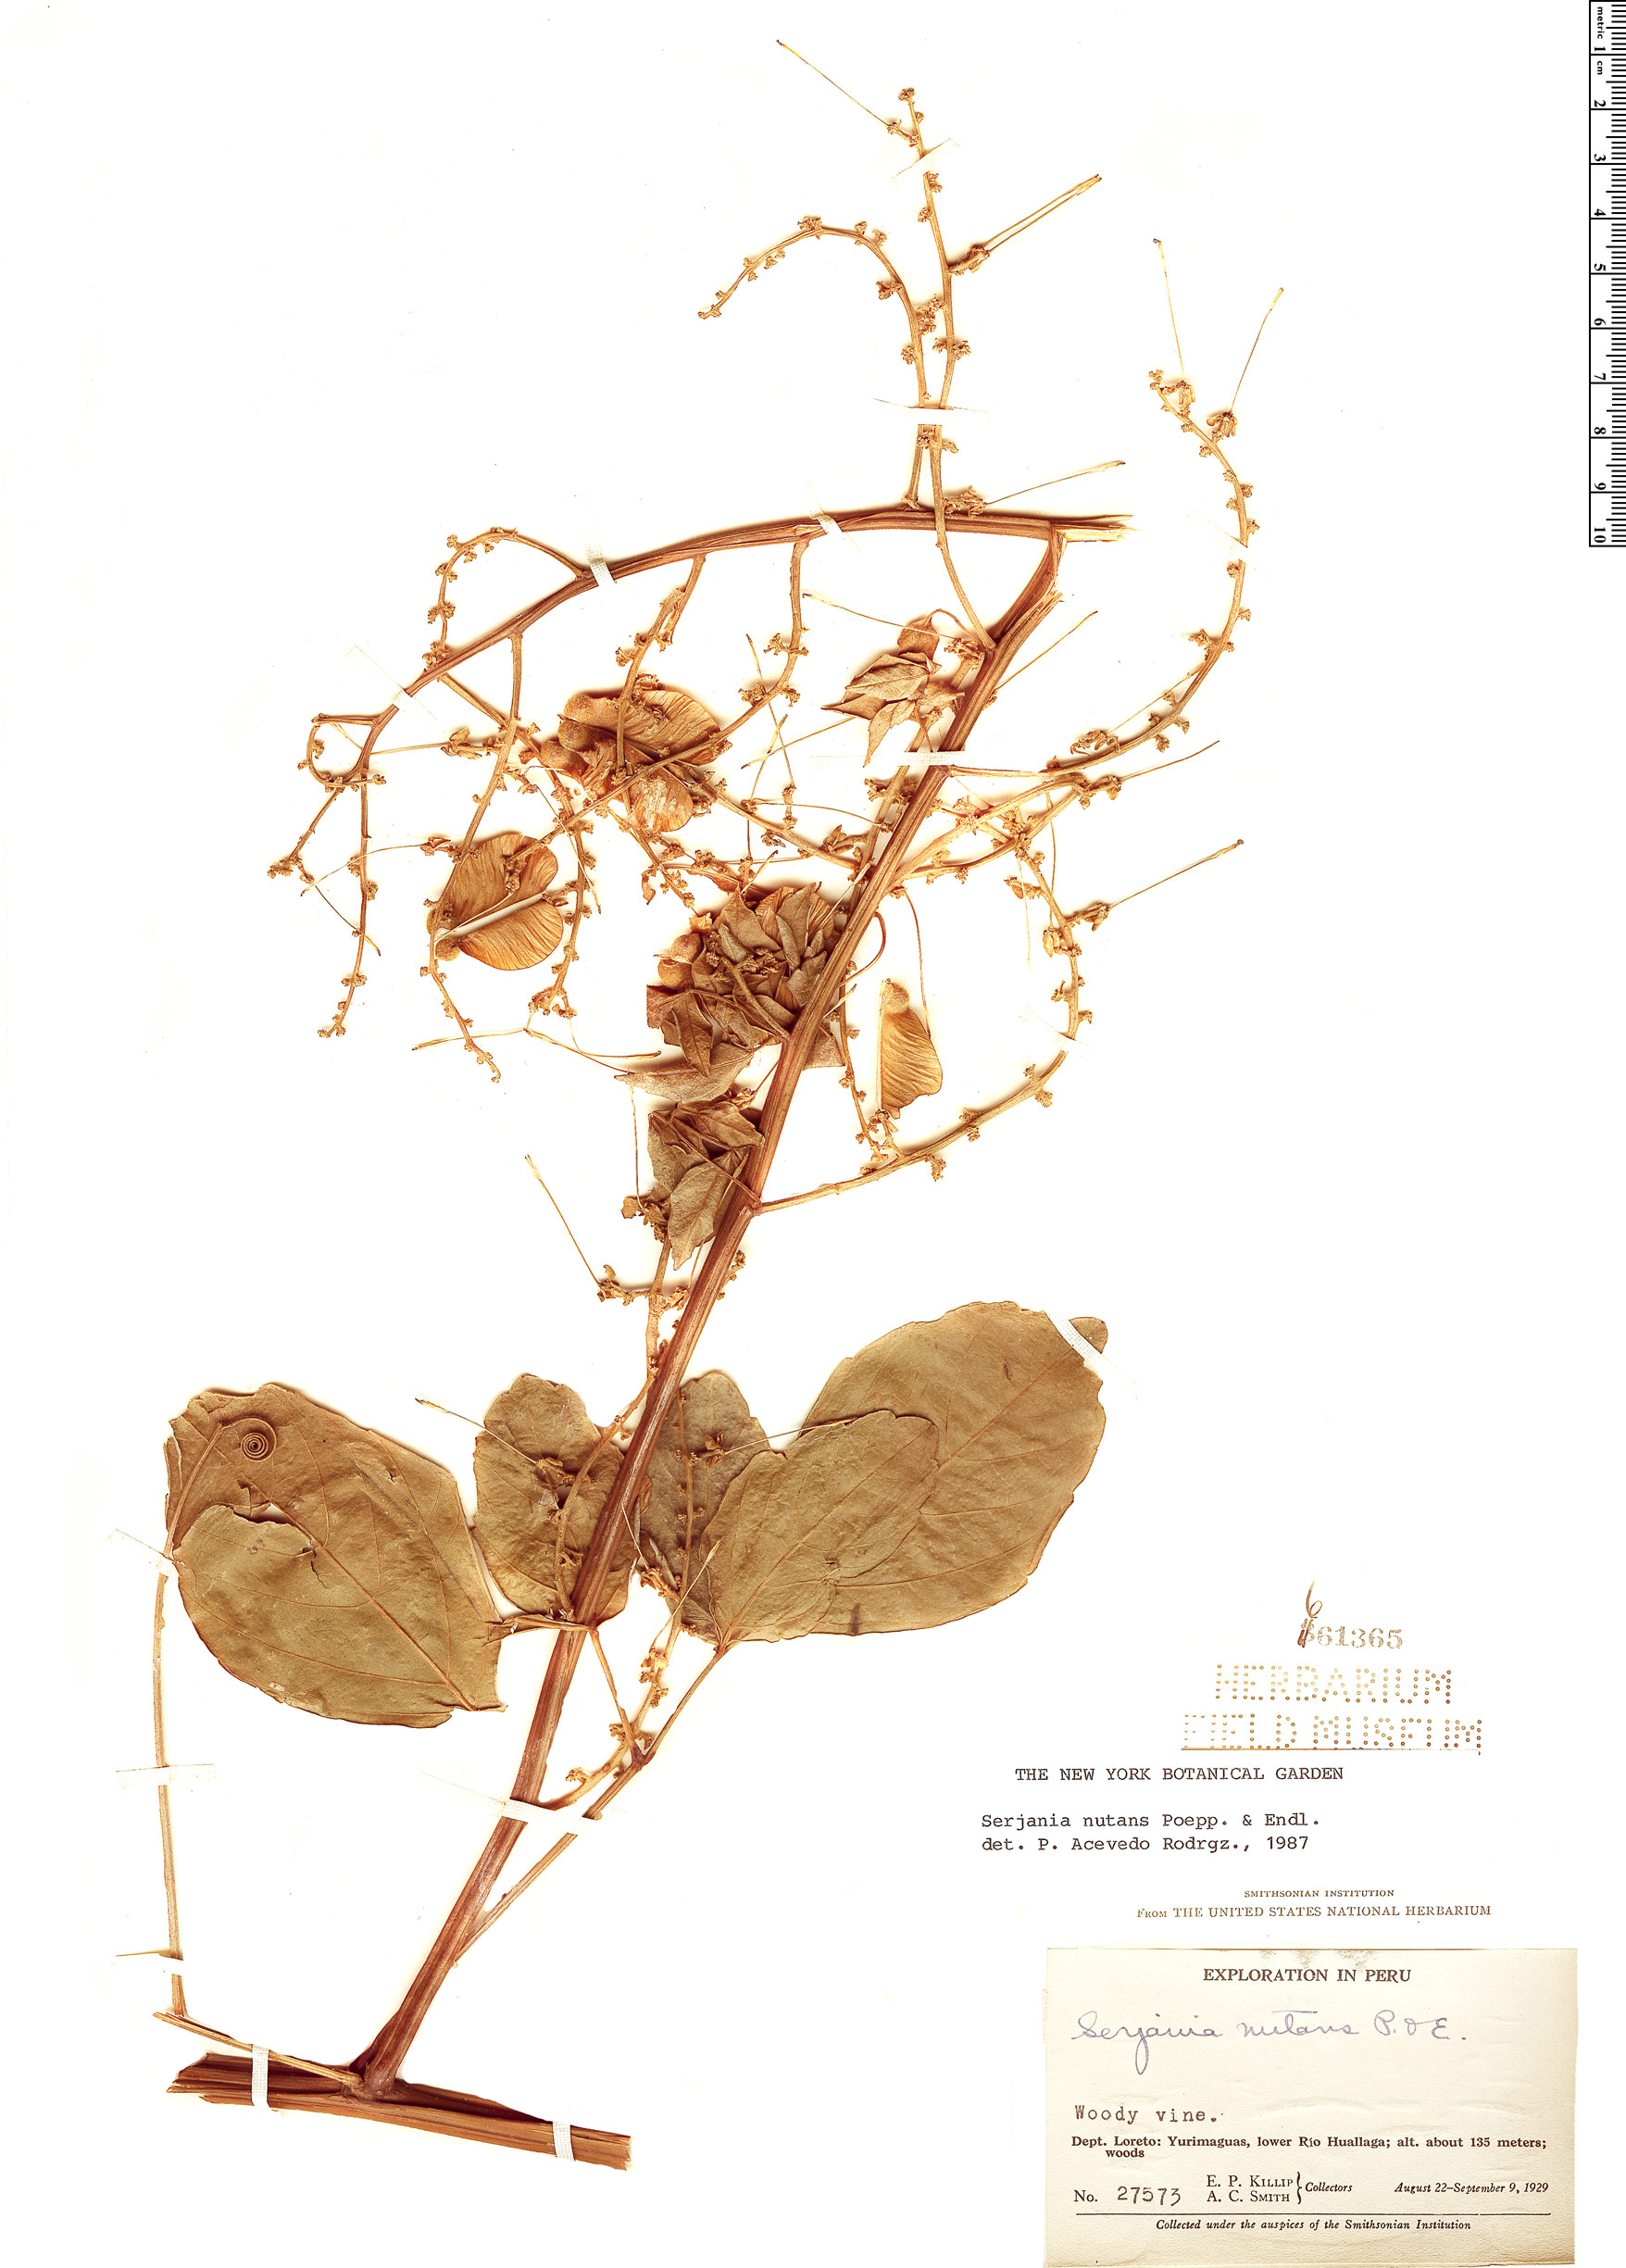 Specimen: Serjania nutans